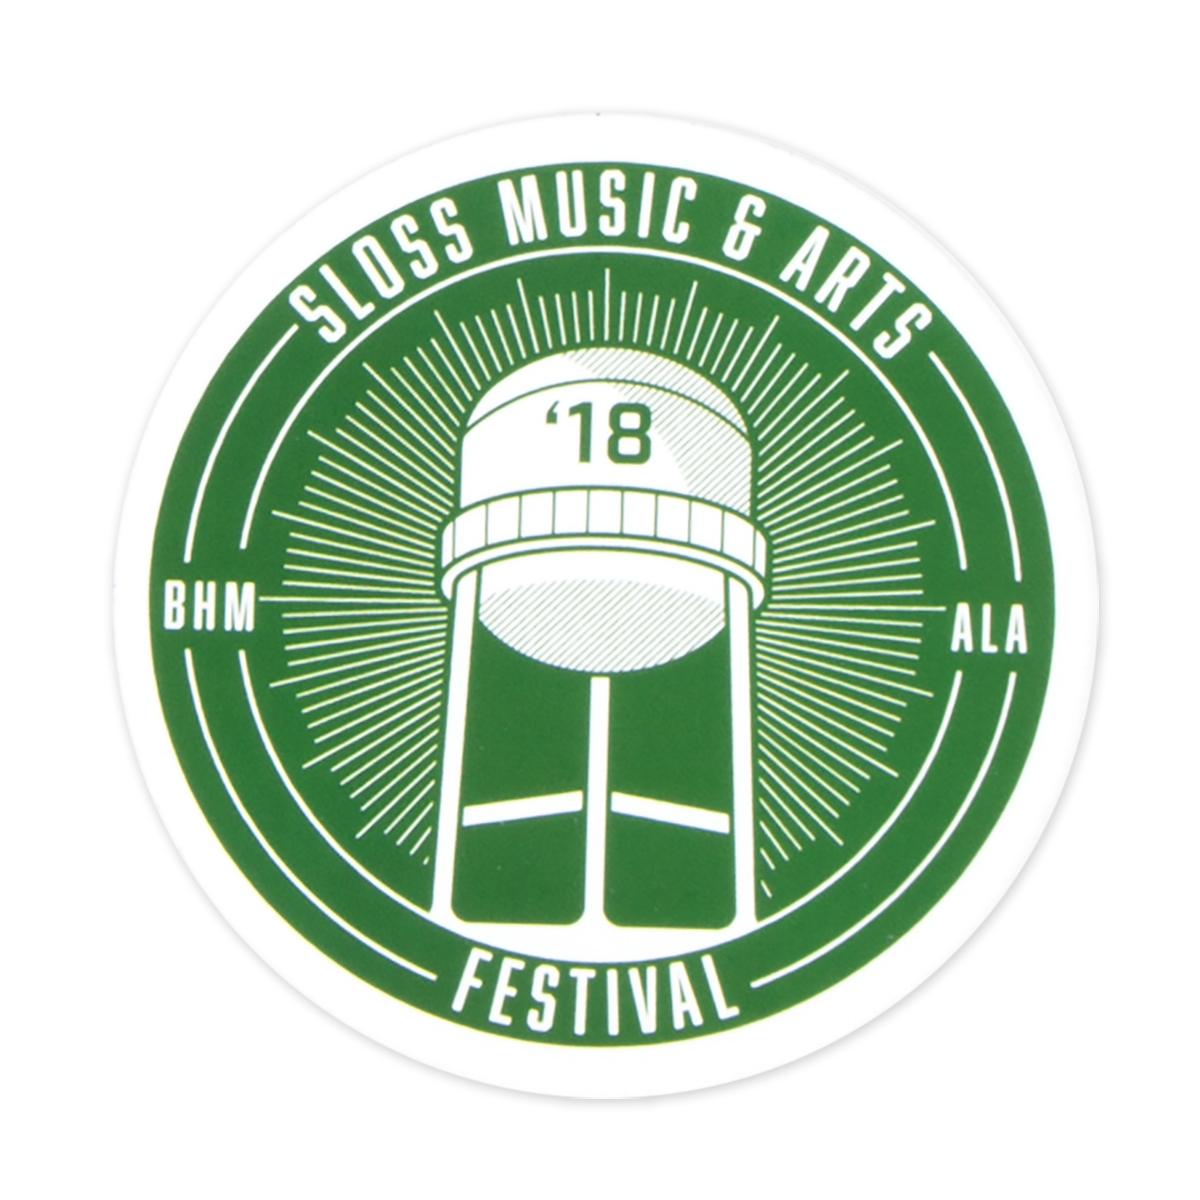 Sloss Music & Arts Festival 2018 Green Sticker